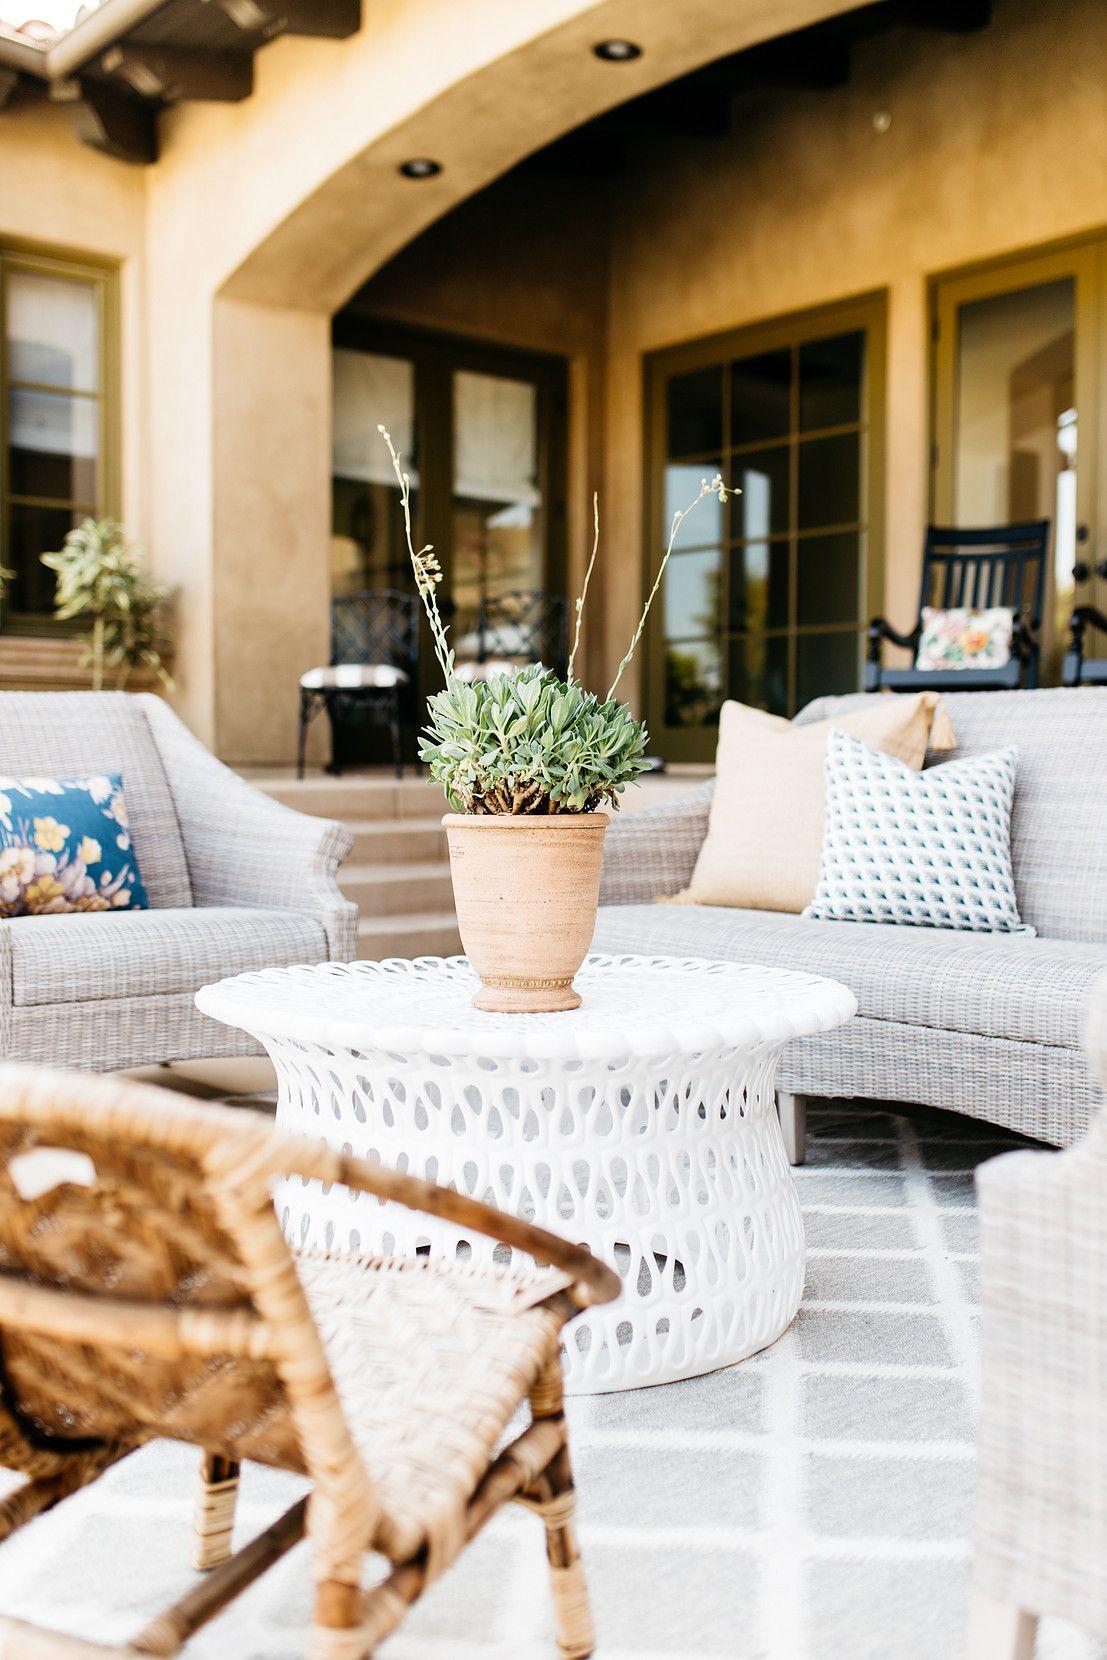 M. Swabb Decor + Style, Outdoor Living Spaces, San Diego, Ca · Boutique Interior  DesignDecor StylesDesign FirmsSan ...